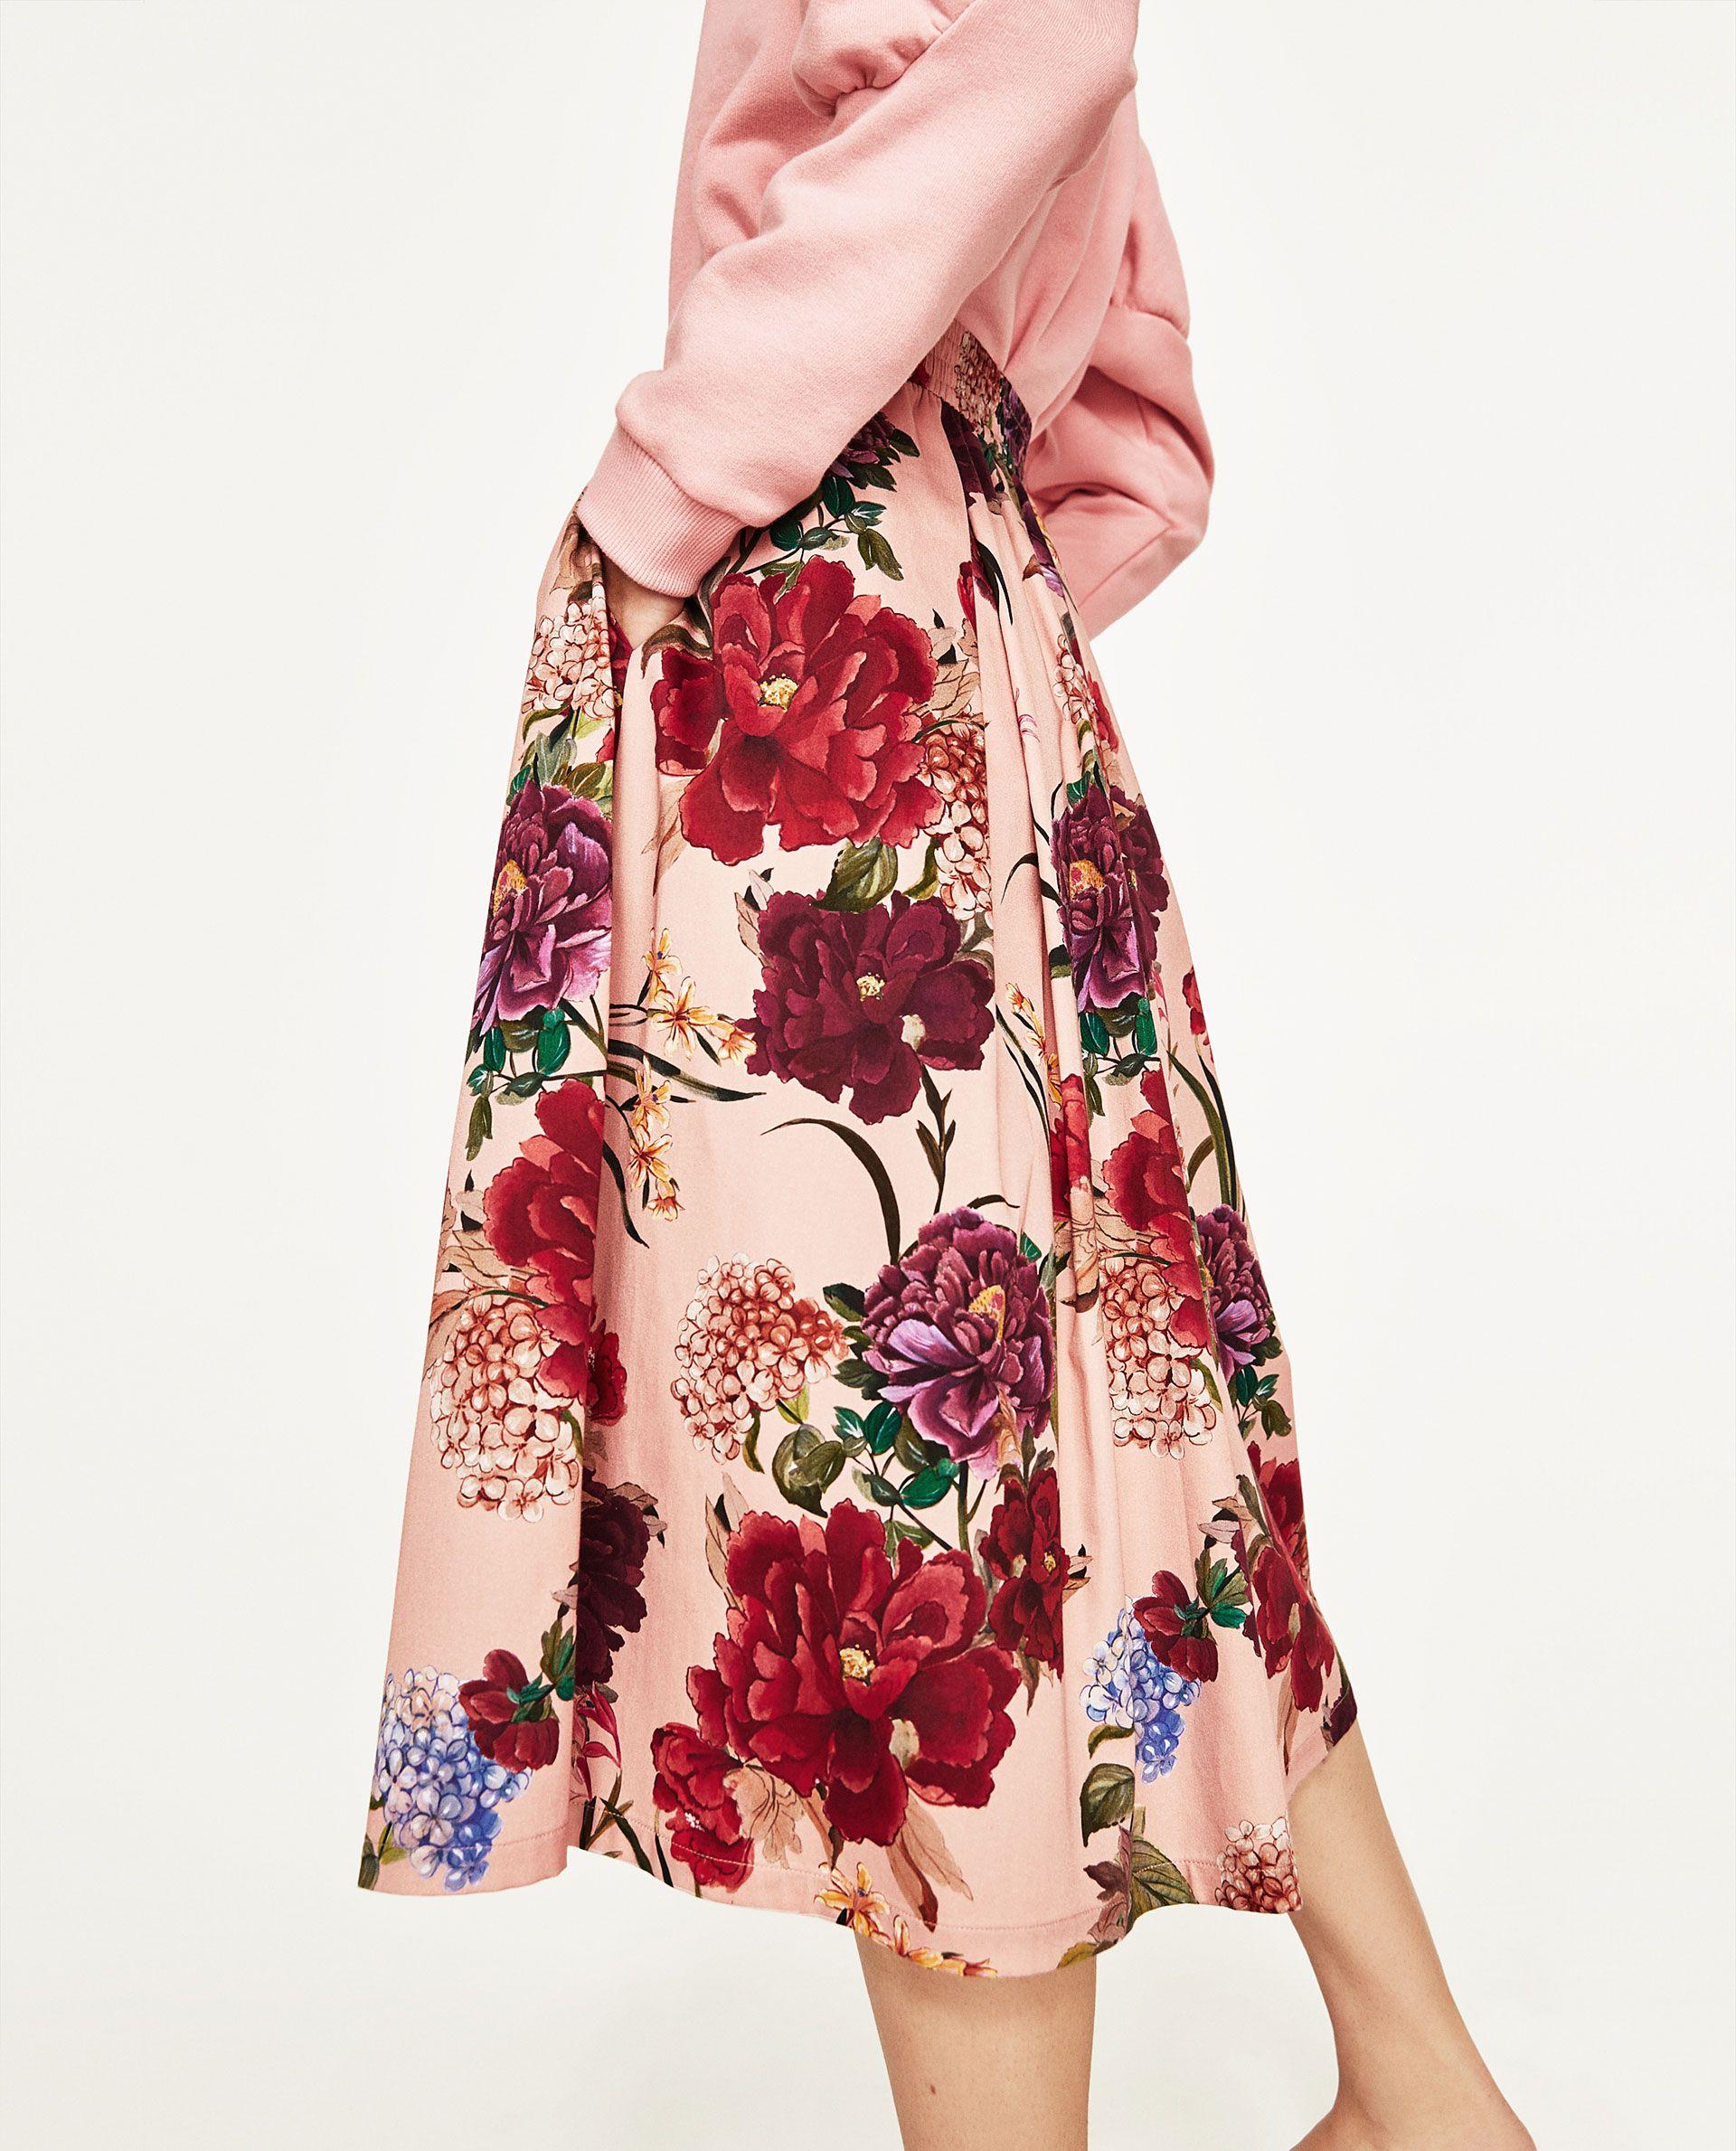 51a3b3c6 ZARA pink floral print skirt | MINE | Floral print skirt, Skirts ...